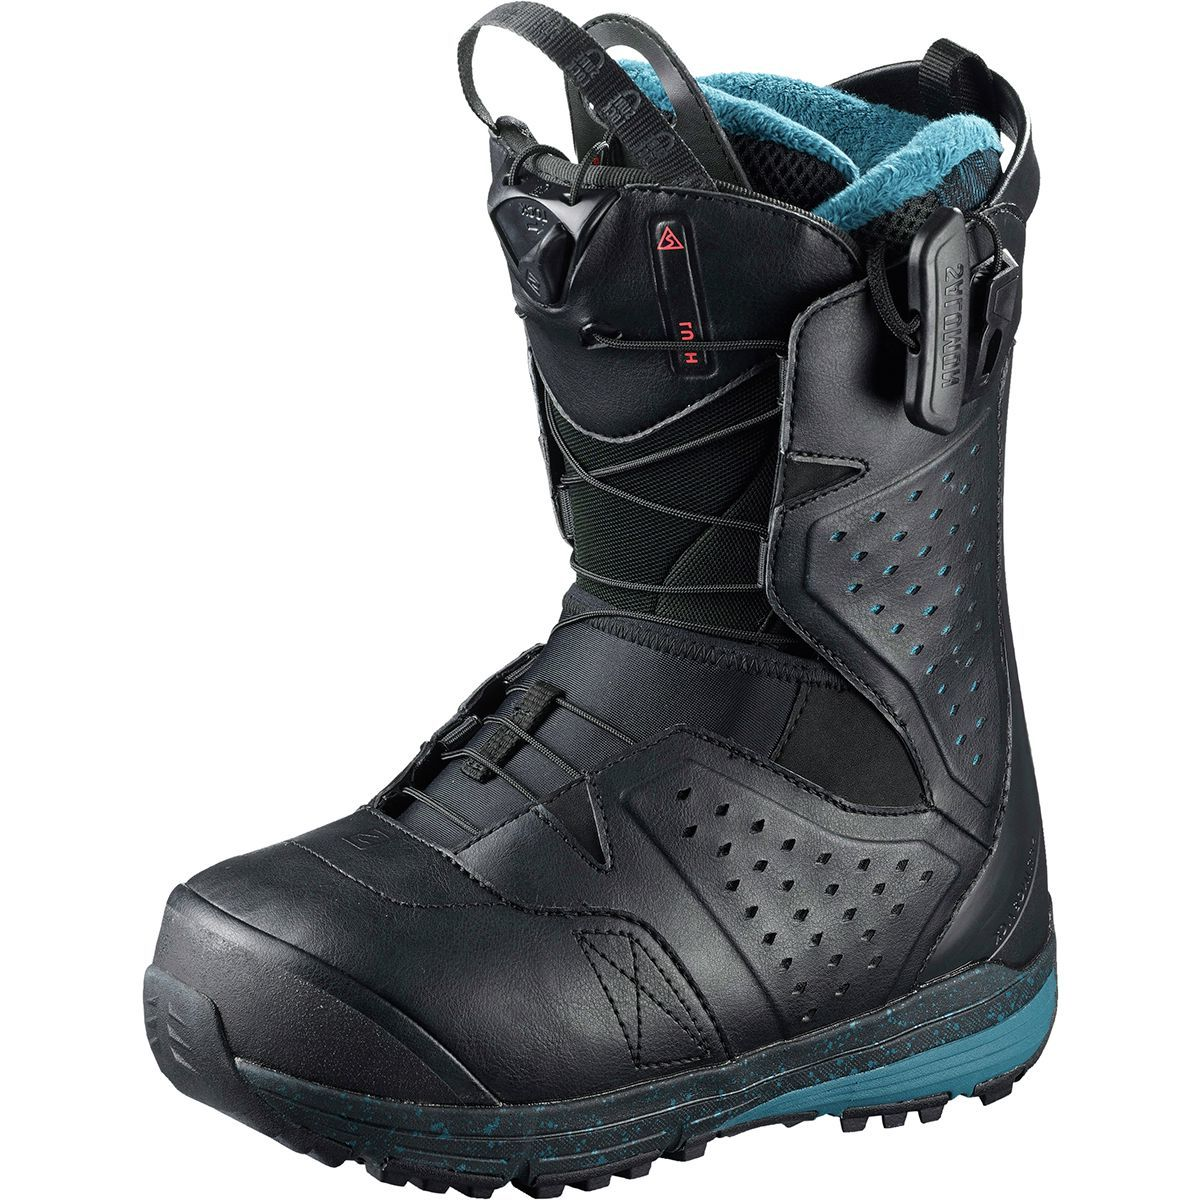 Salomon Snowboards Lush Snowboard Boot - Women's